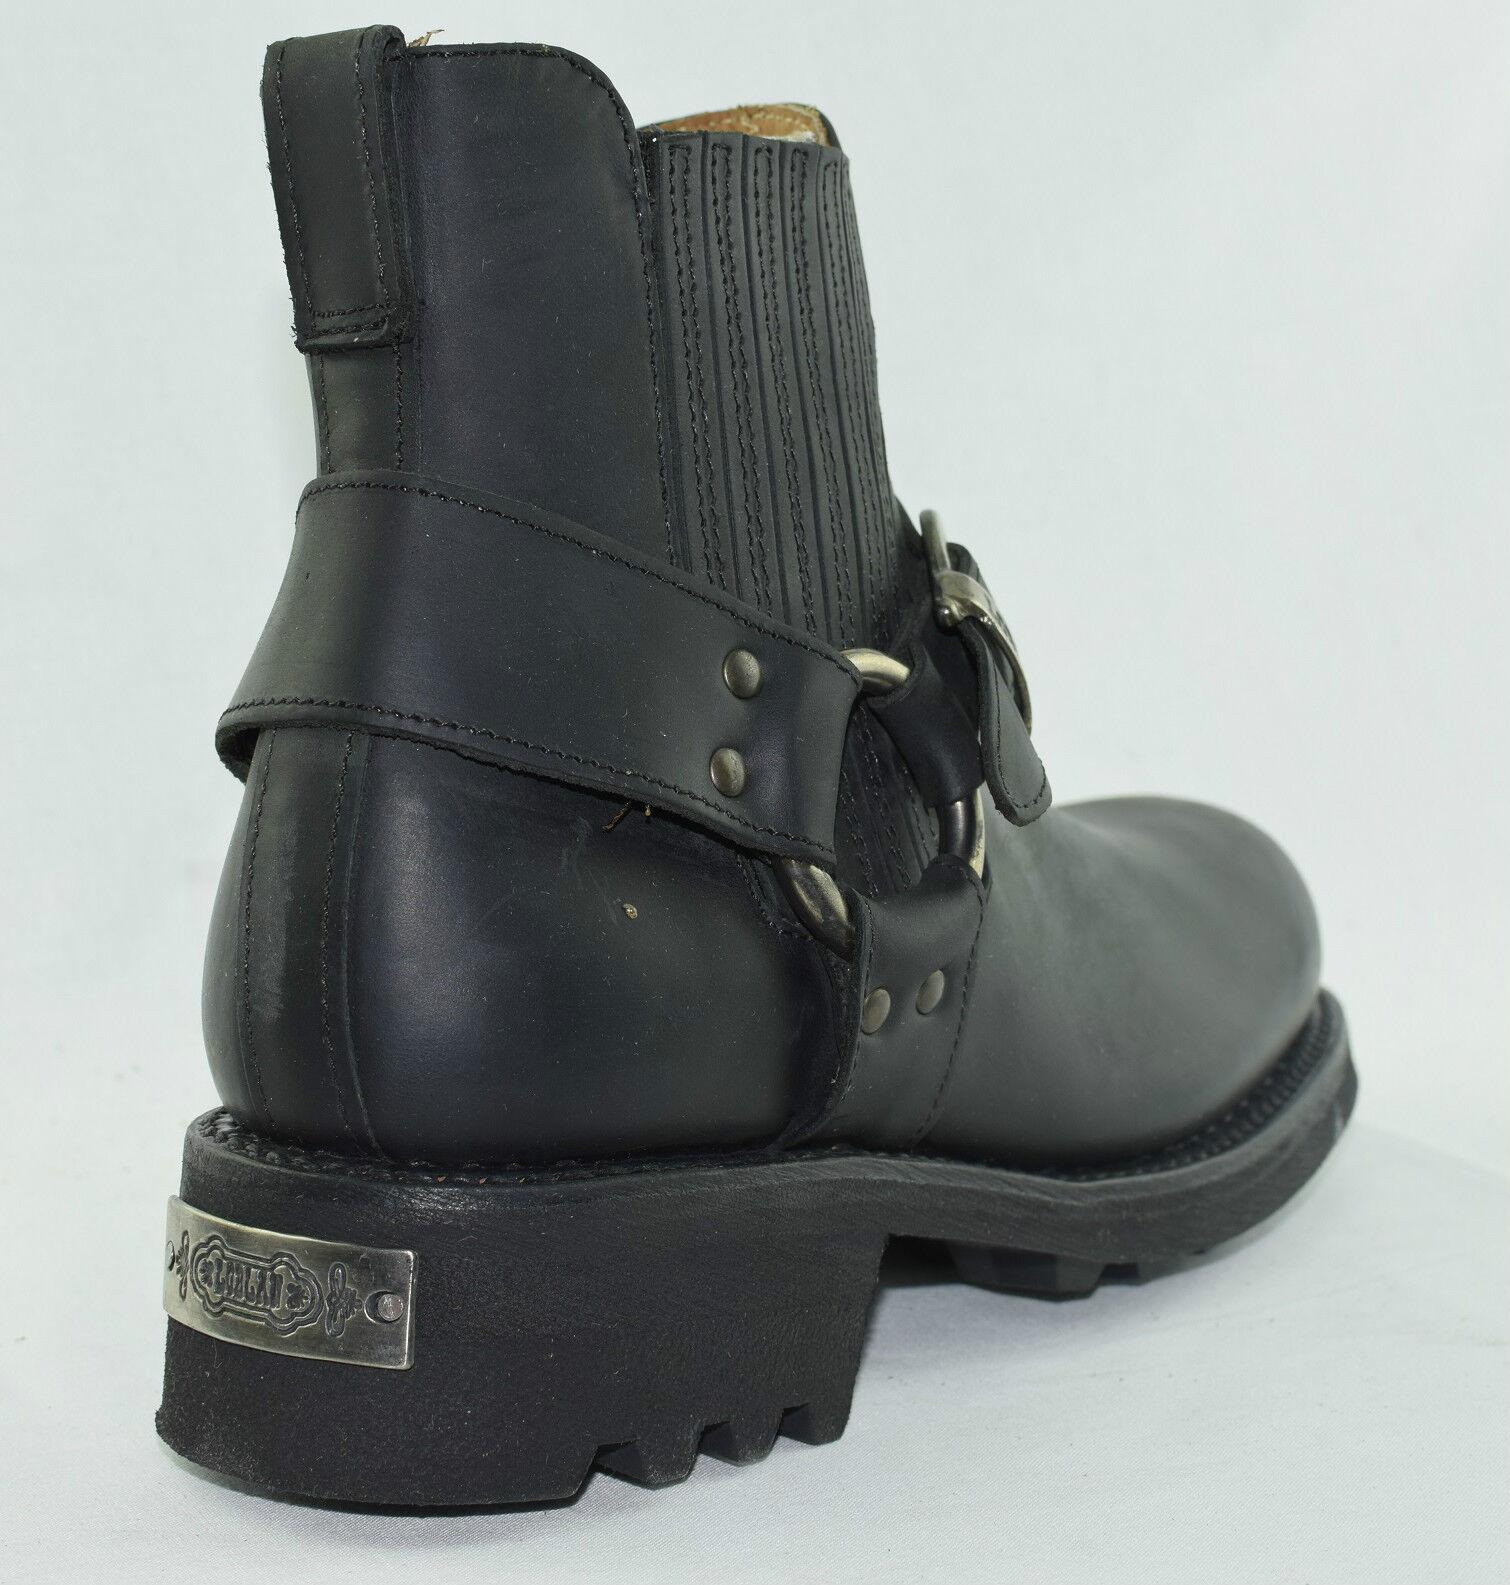 Loblan 611 Black Boots Waxy Leather Men'S Biker Boots Black Classic Round Toe Handmade Bike 1d53ef